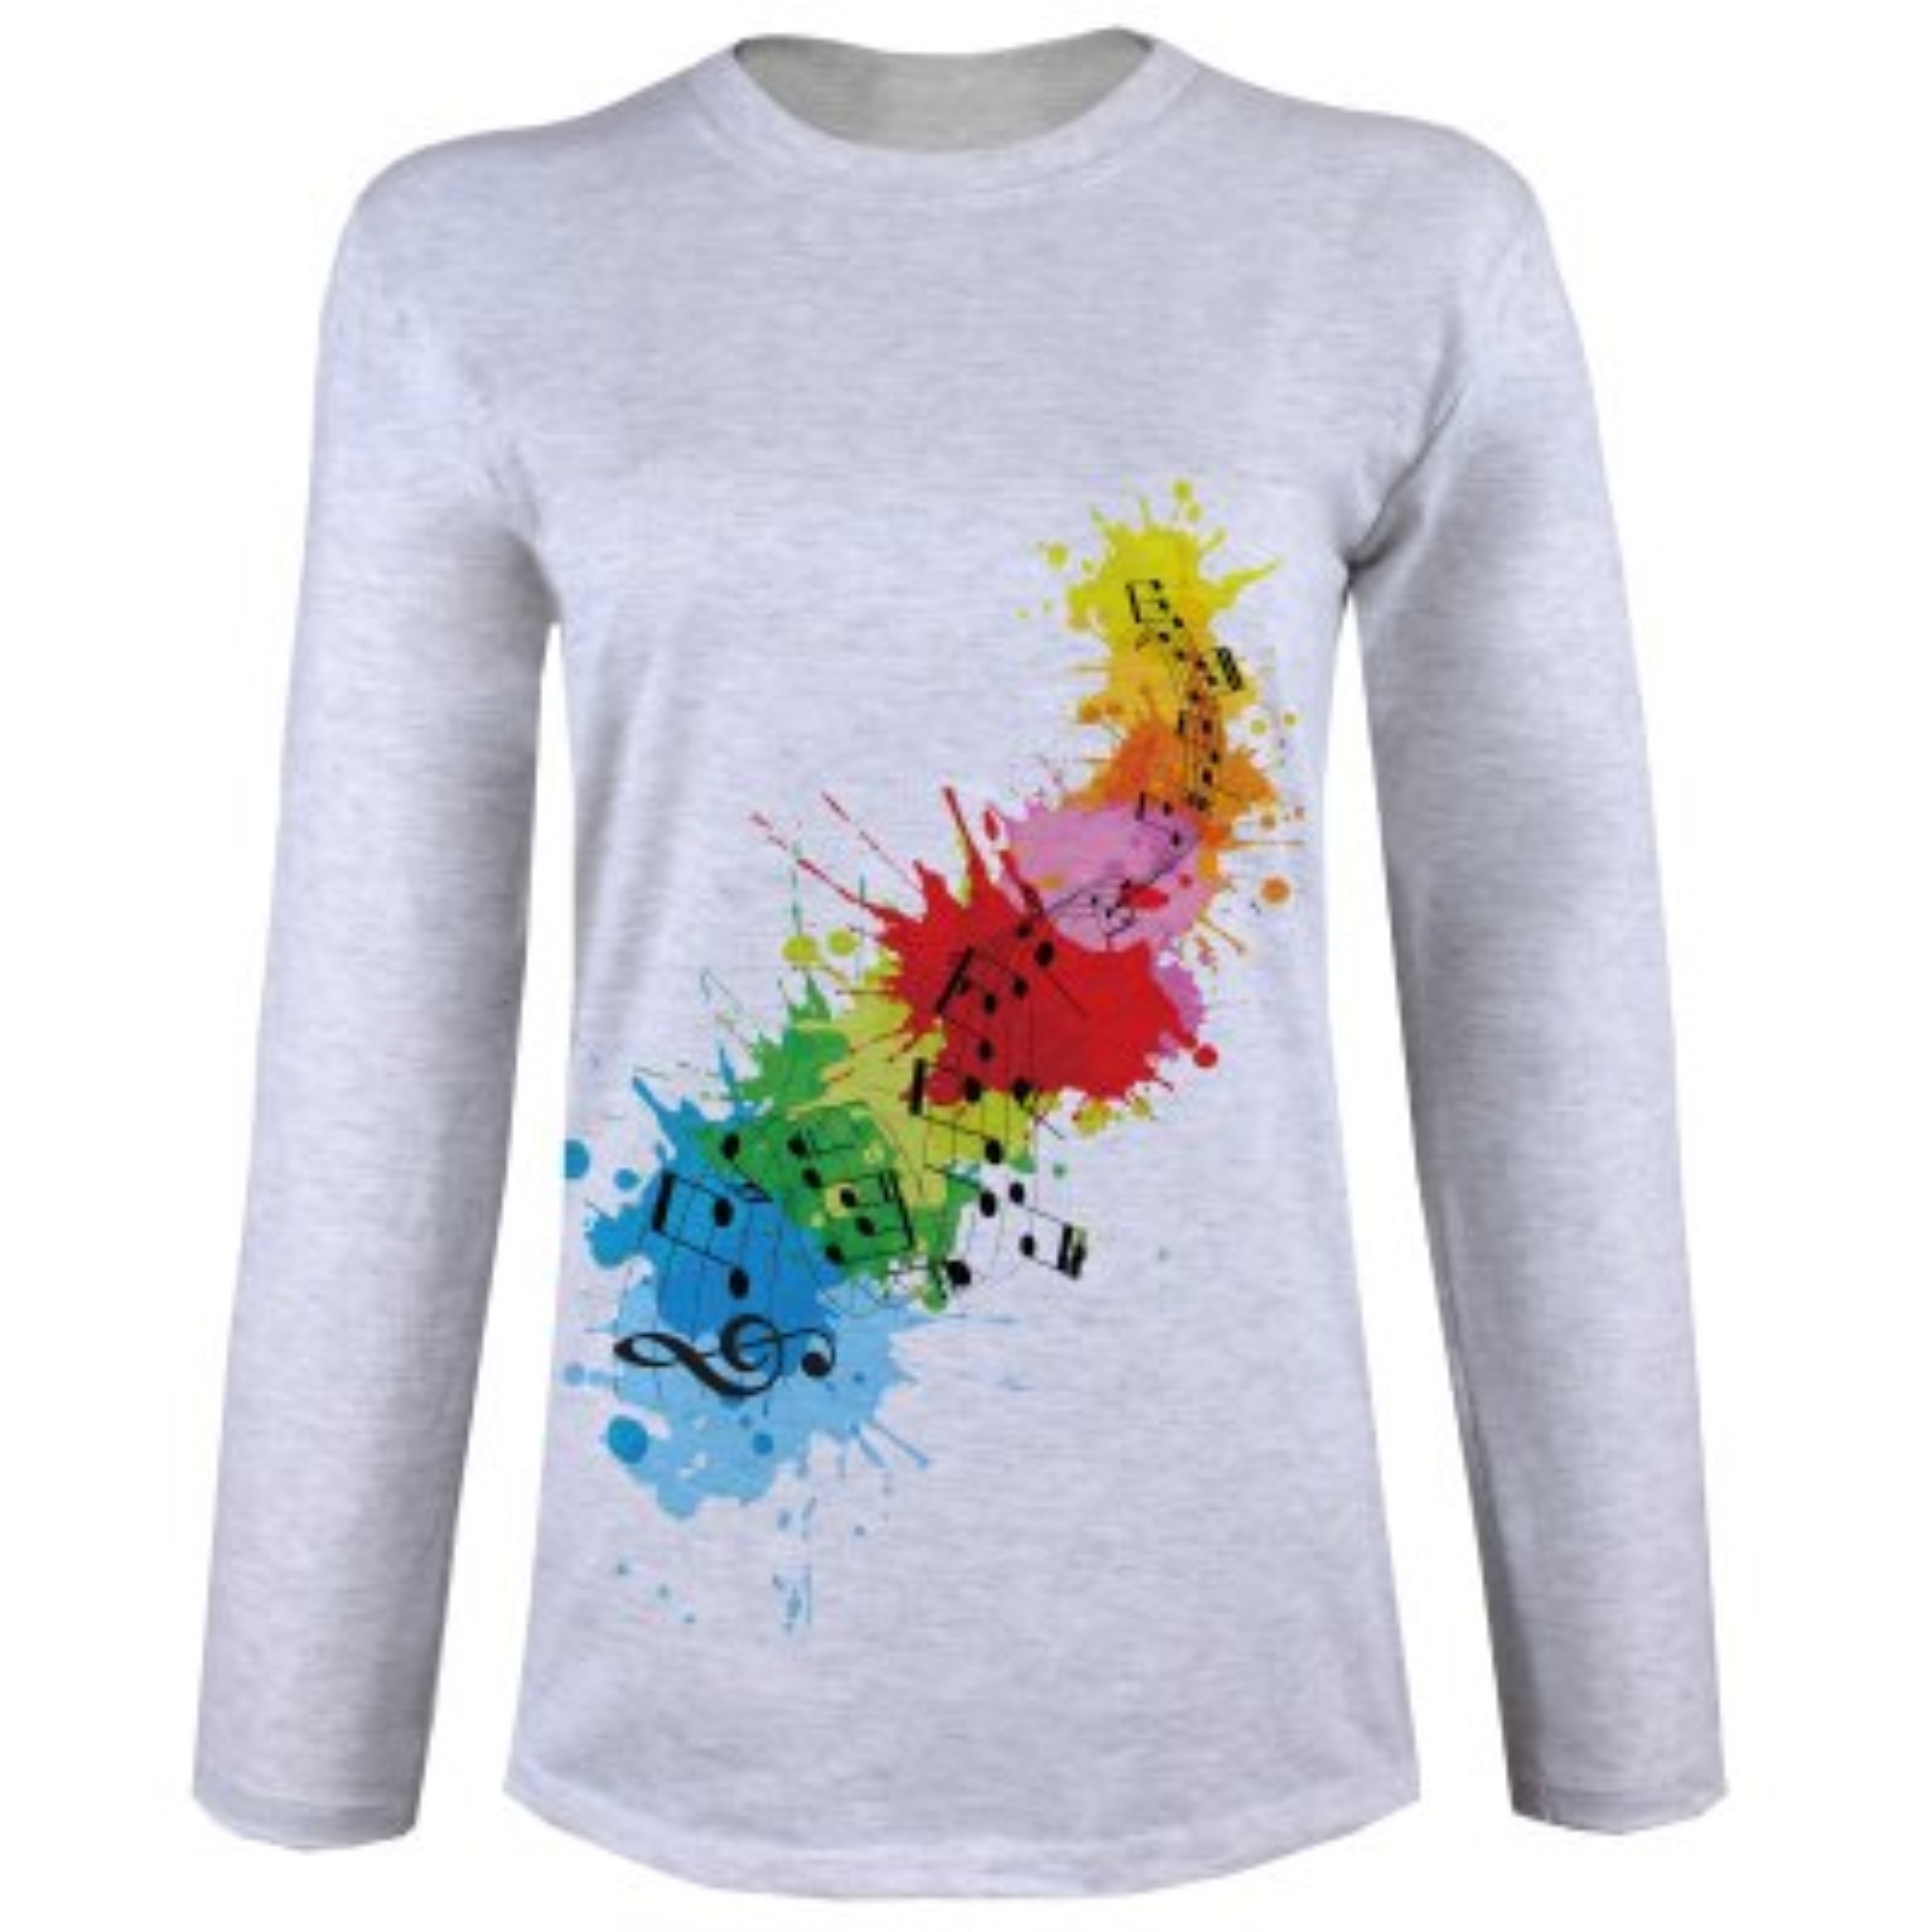 Photo of تی شرت  آستین بلند زنانه  طرح موزیک کد B75